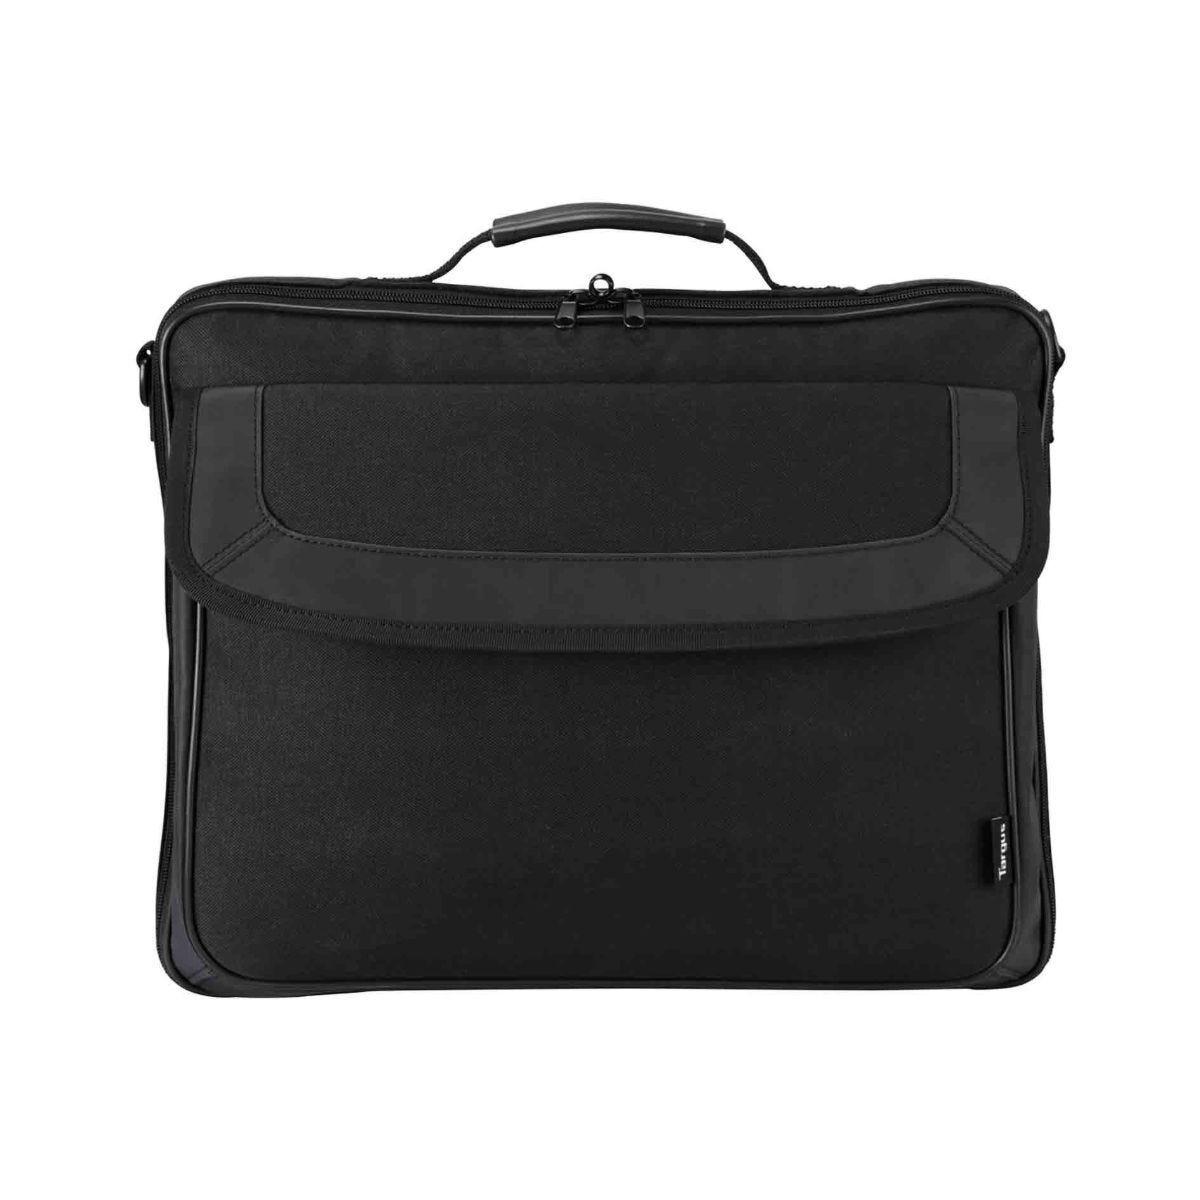 Targus Classic Clamshell Laptop Bag 15-15.6 Inch Black